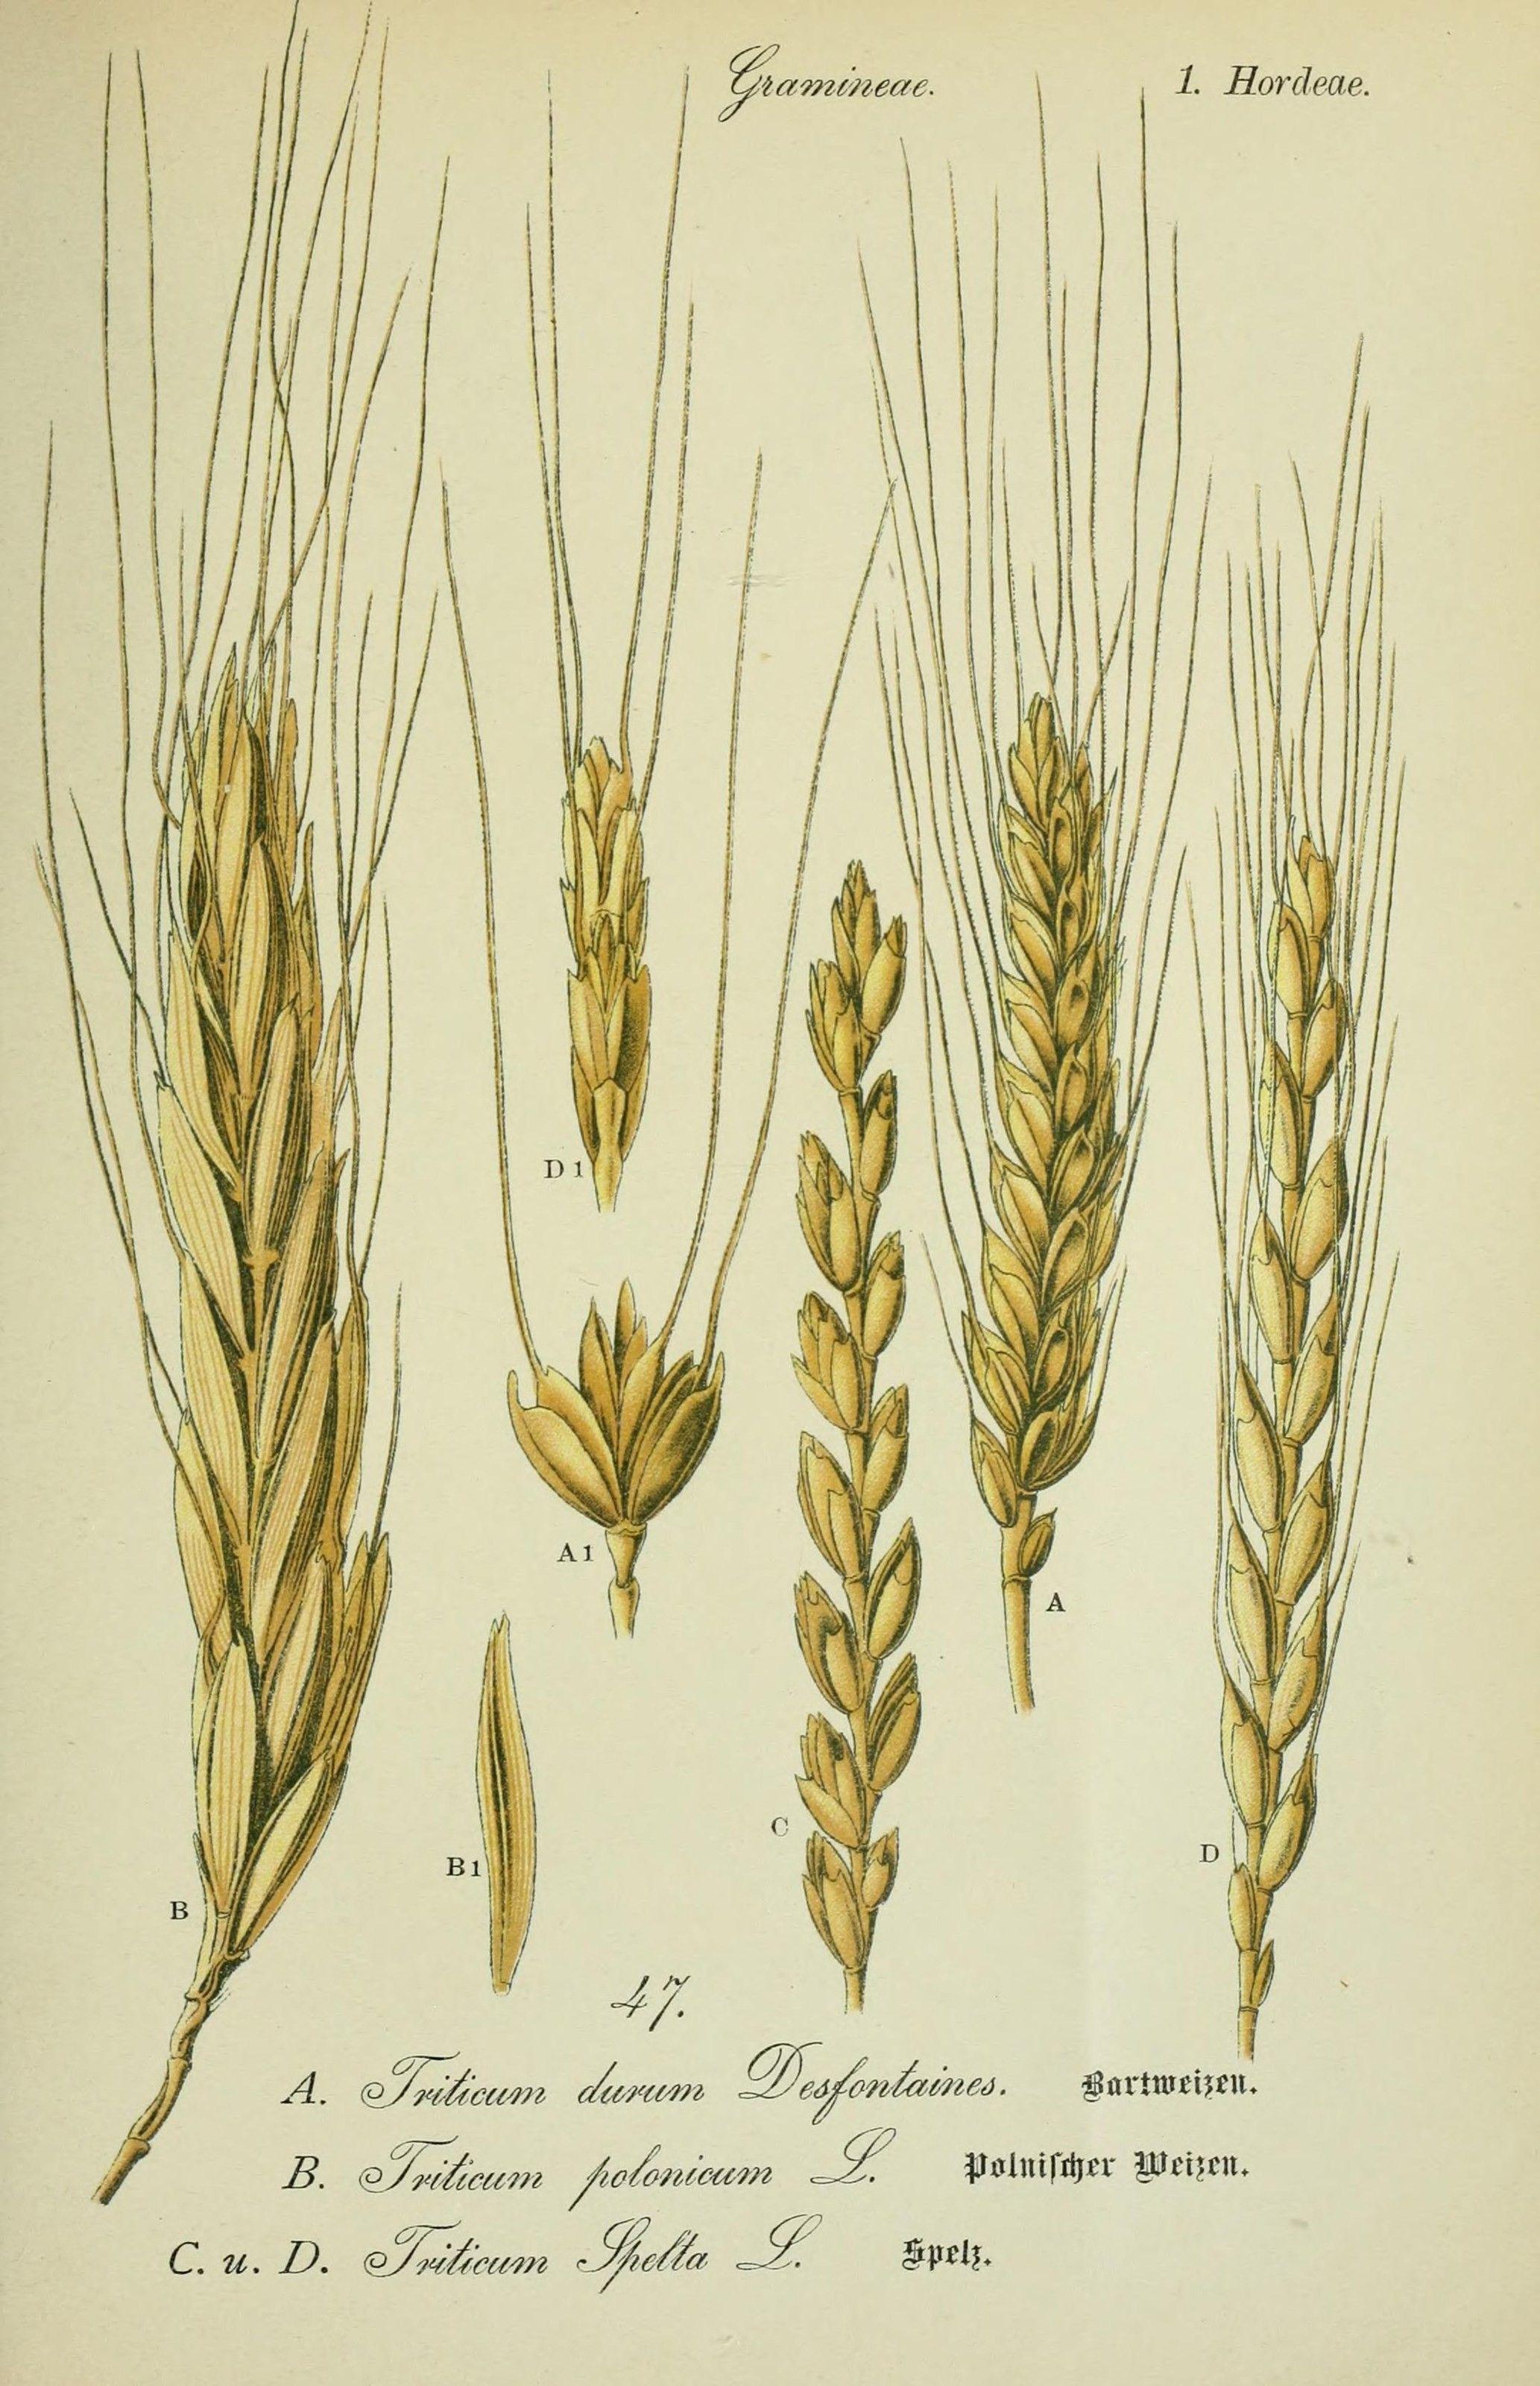 Plant-illustration-of-Spelt